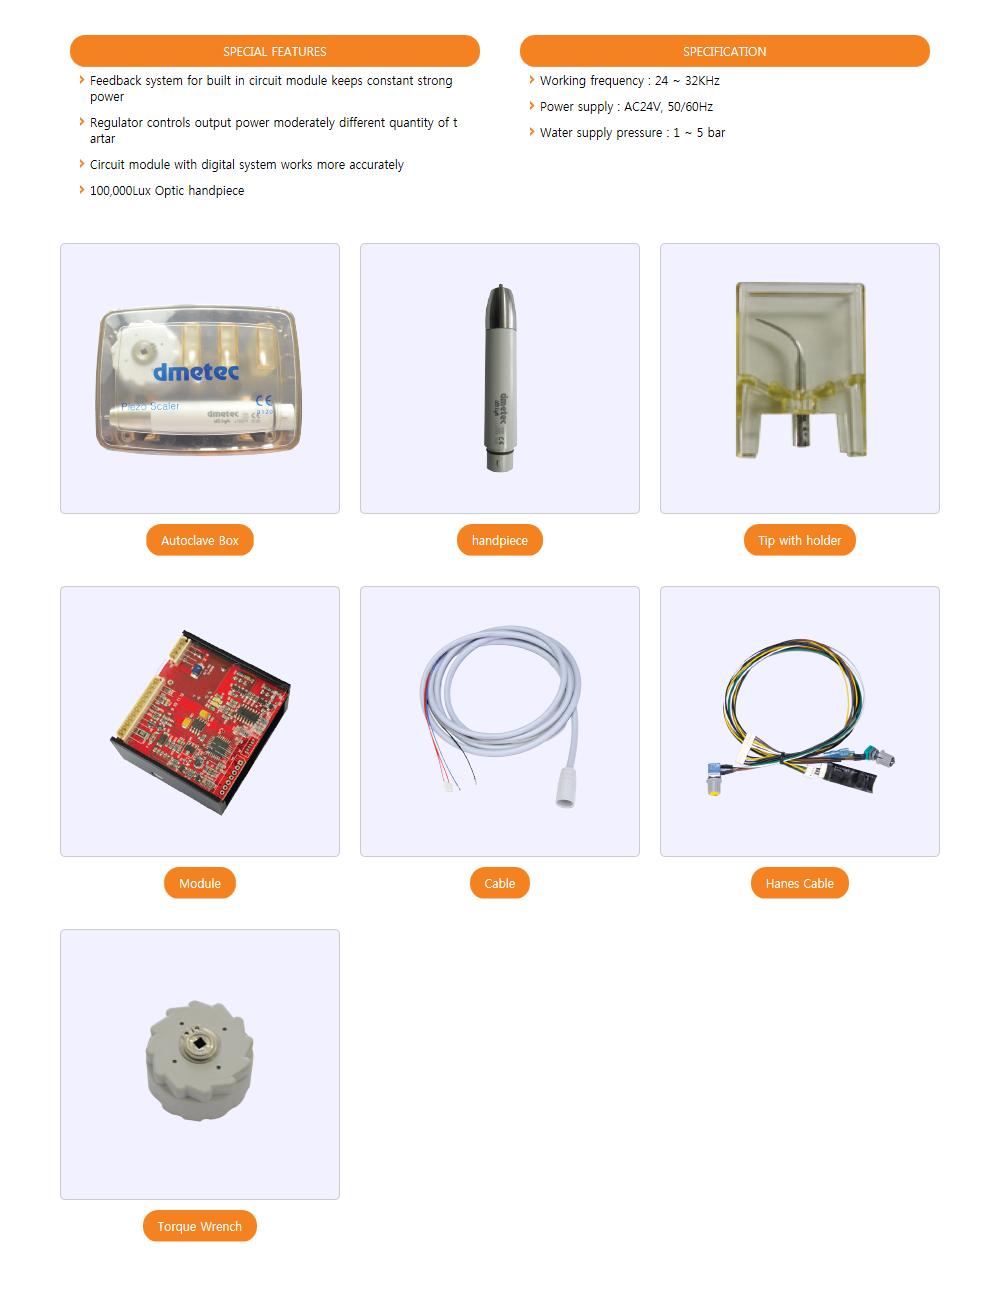 Dmetec Ultrasonic Scaler LED Compact S